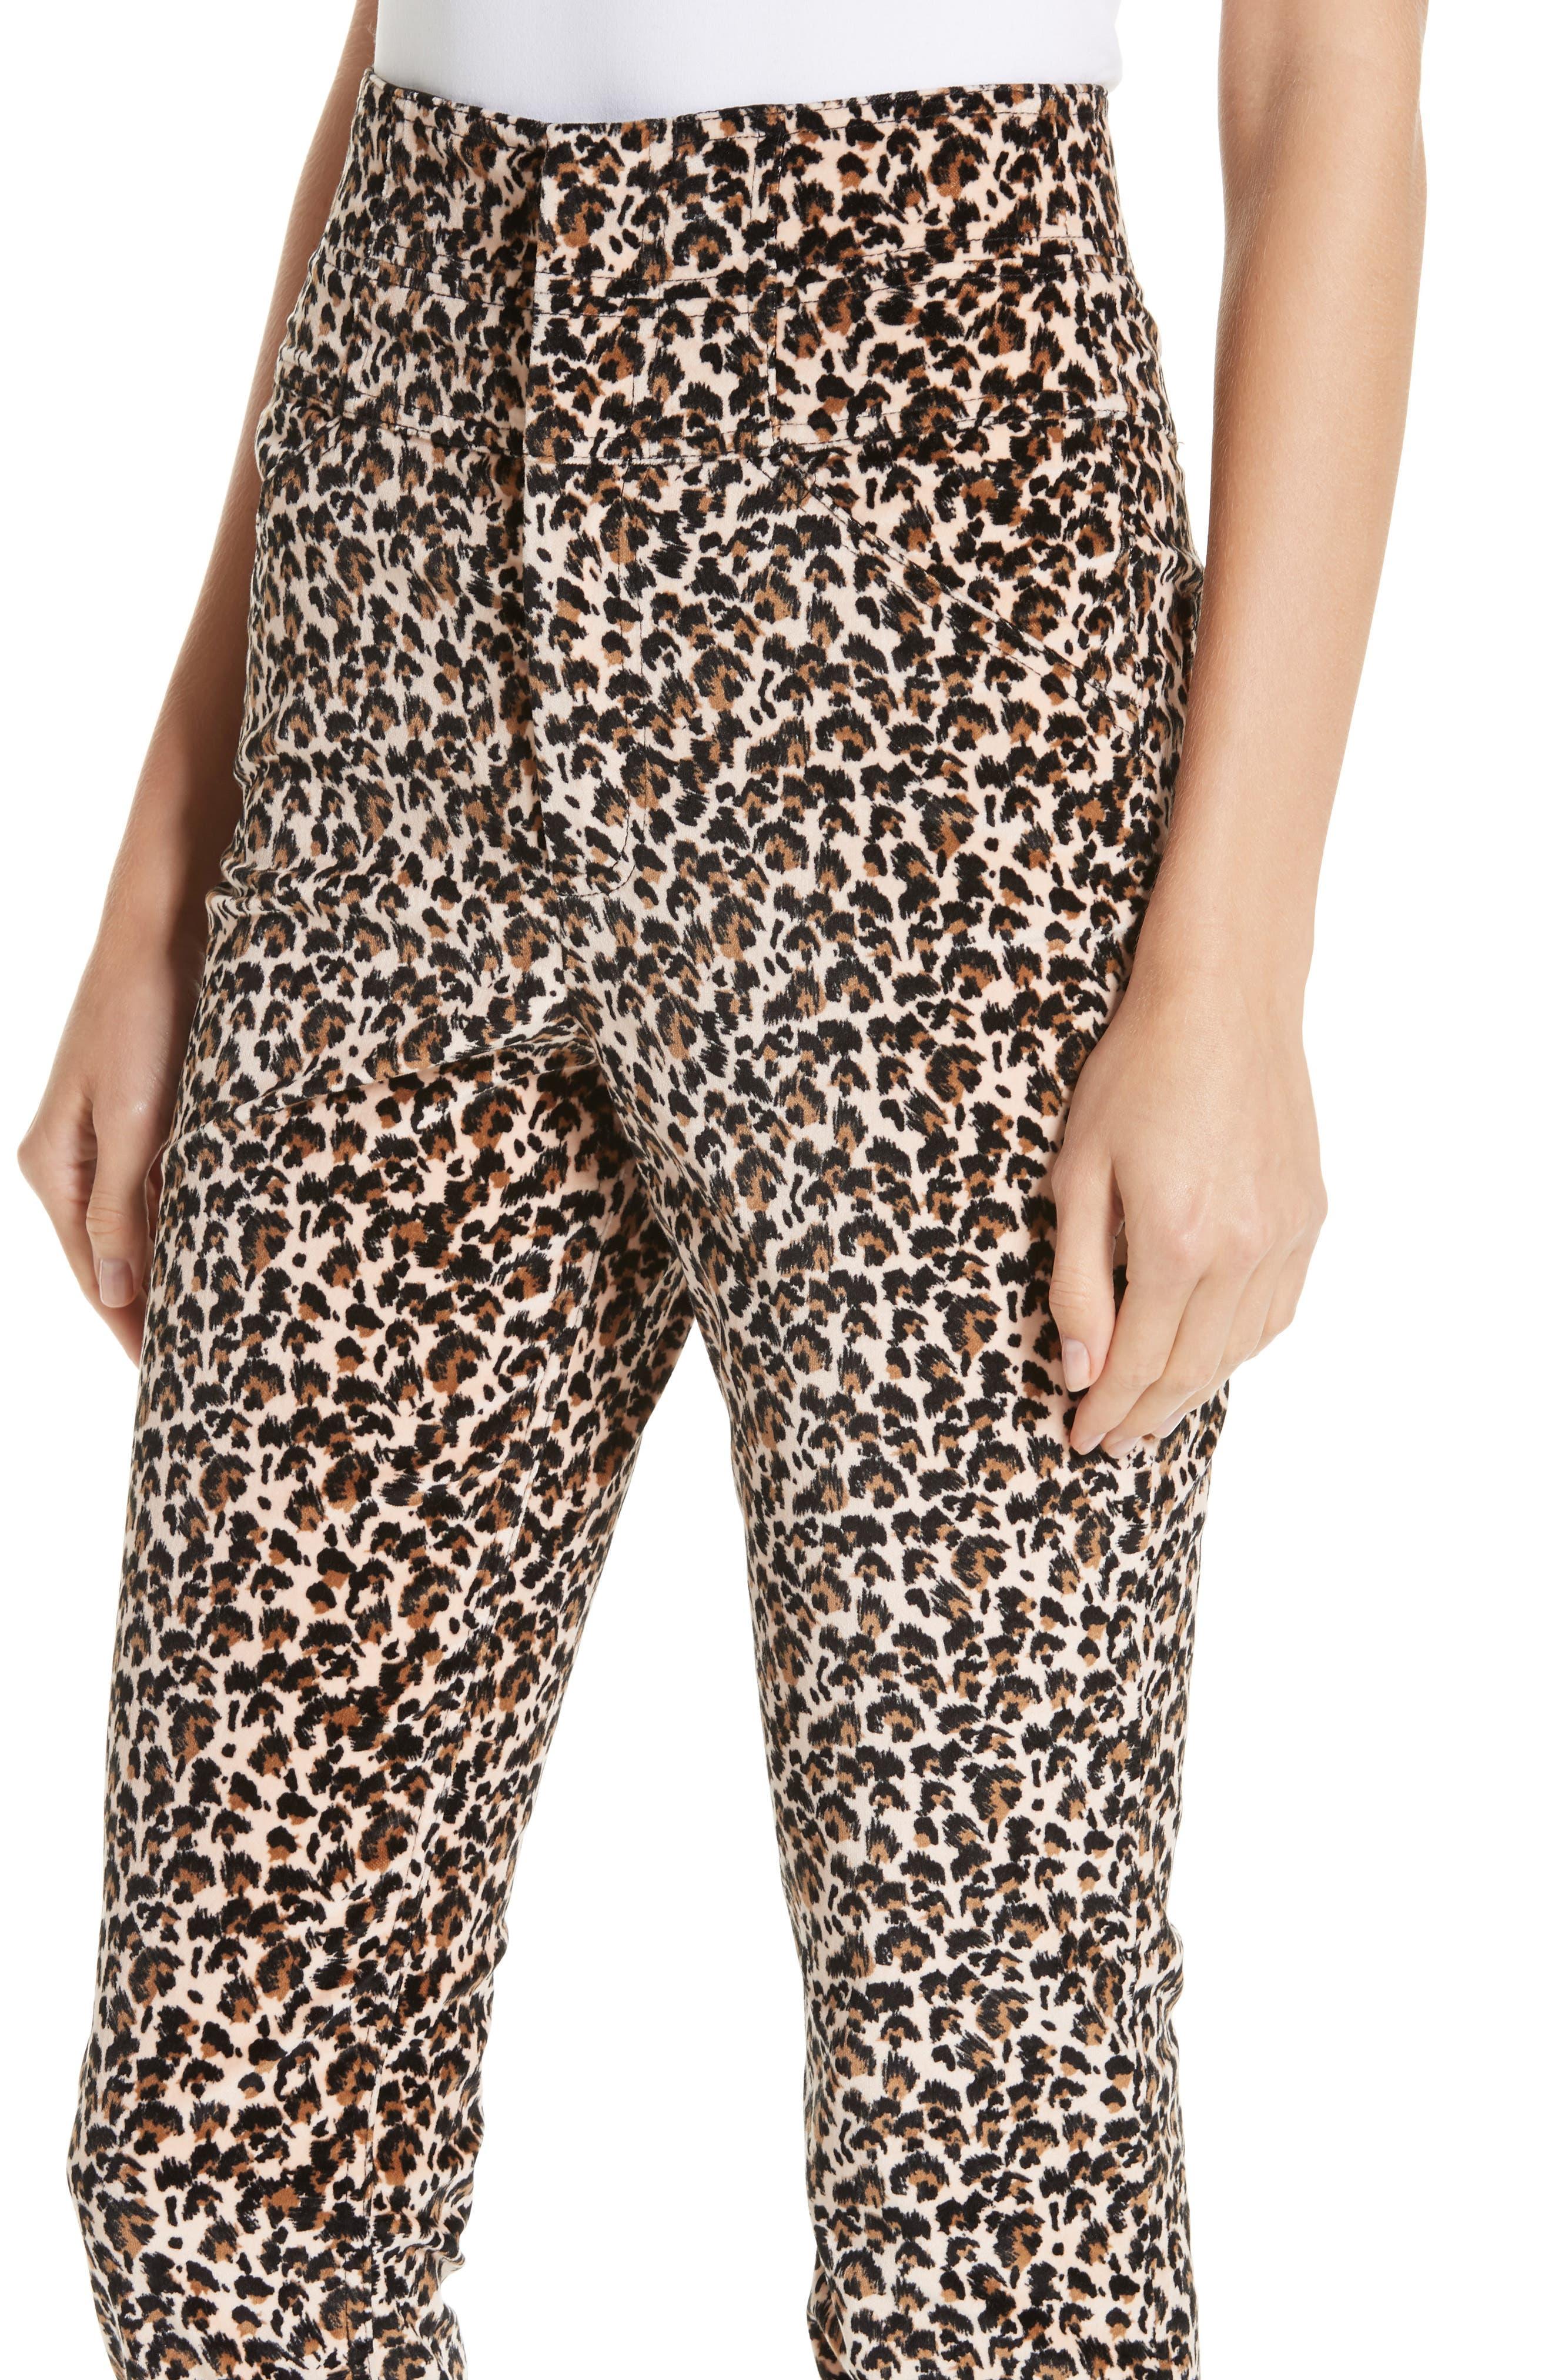 Leopard Print Stretch Velvet Pants,                             Alternate thumbnail 4, color,                             250